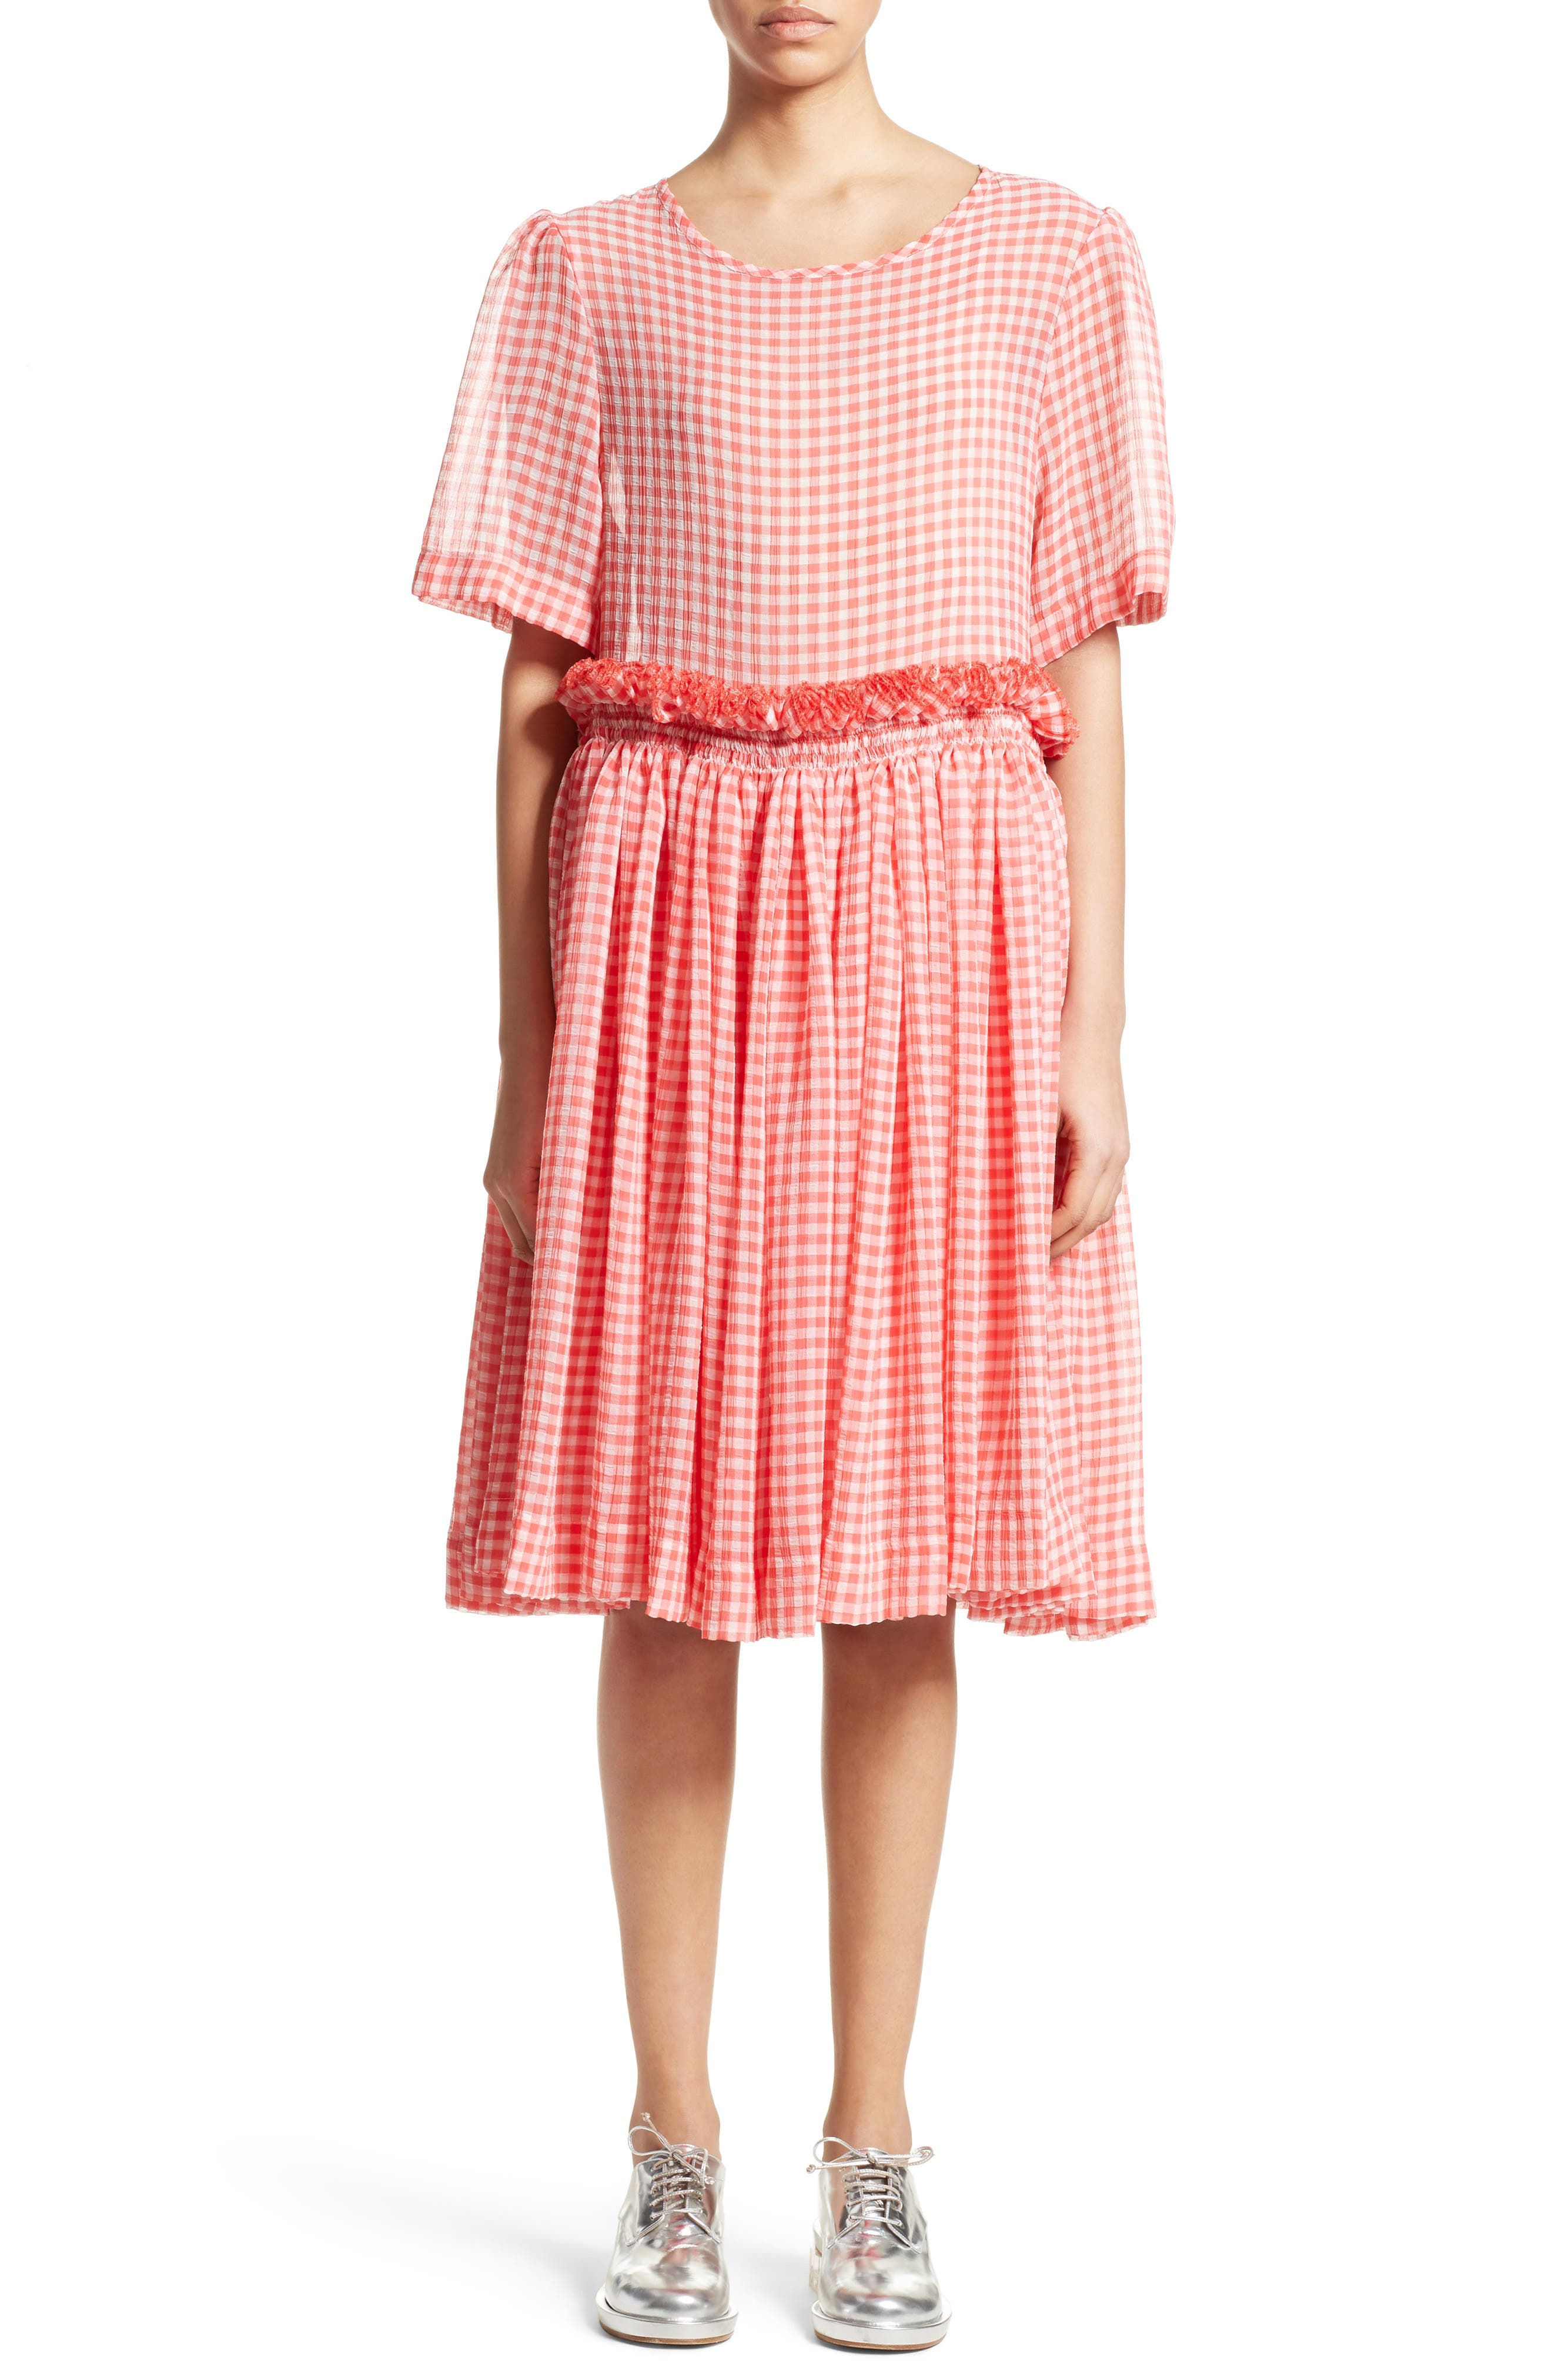 Molly Goddard Teen Dress